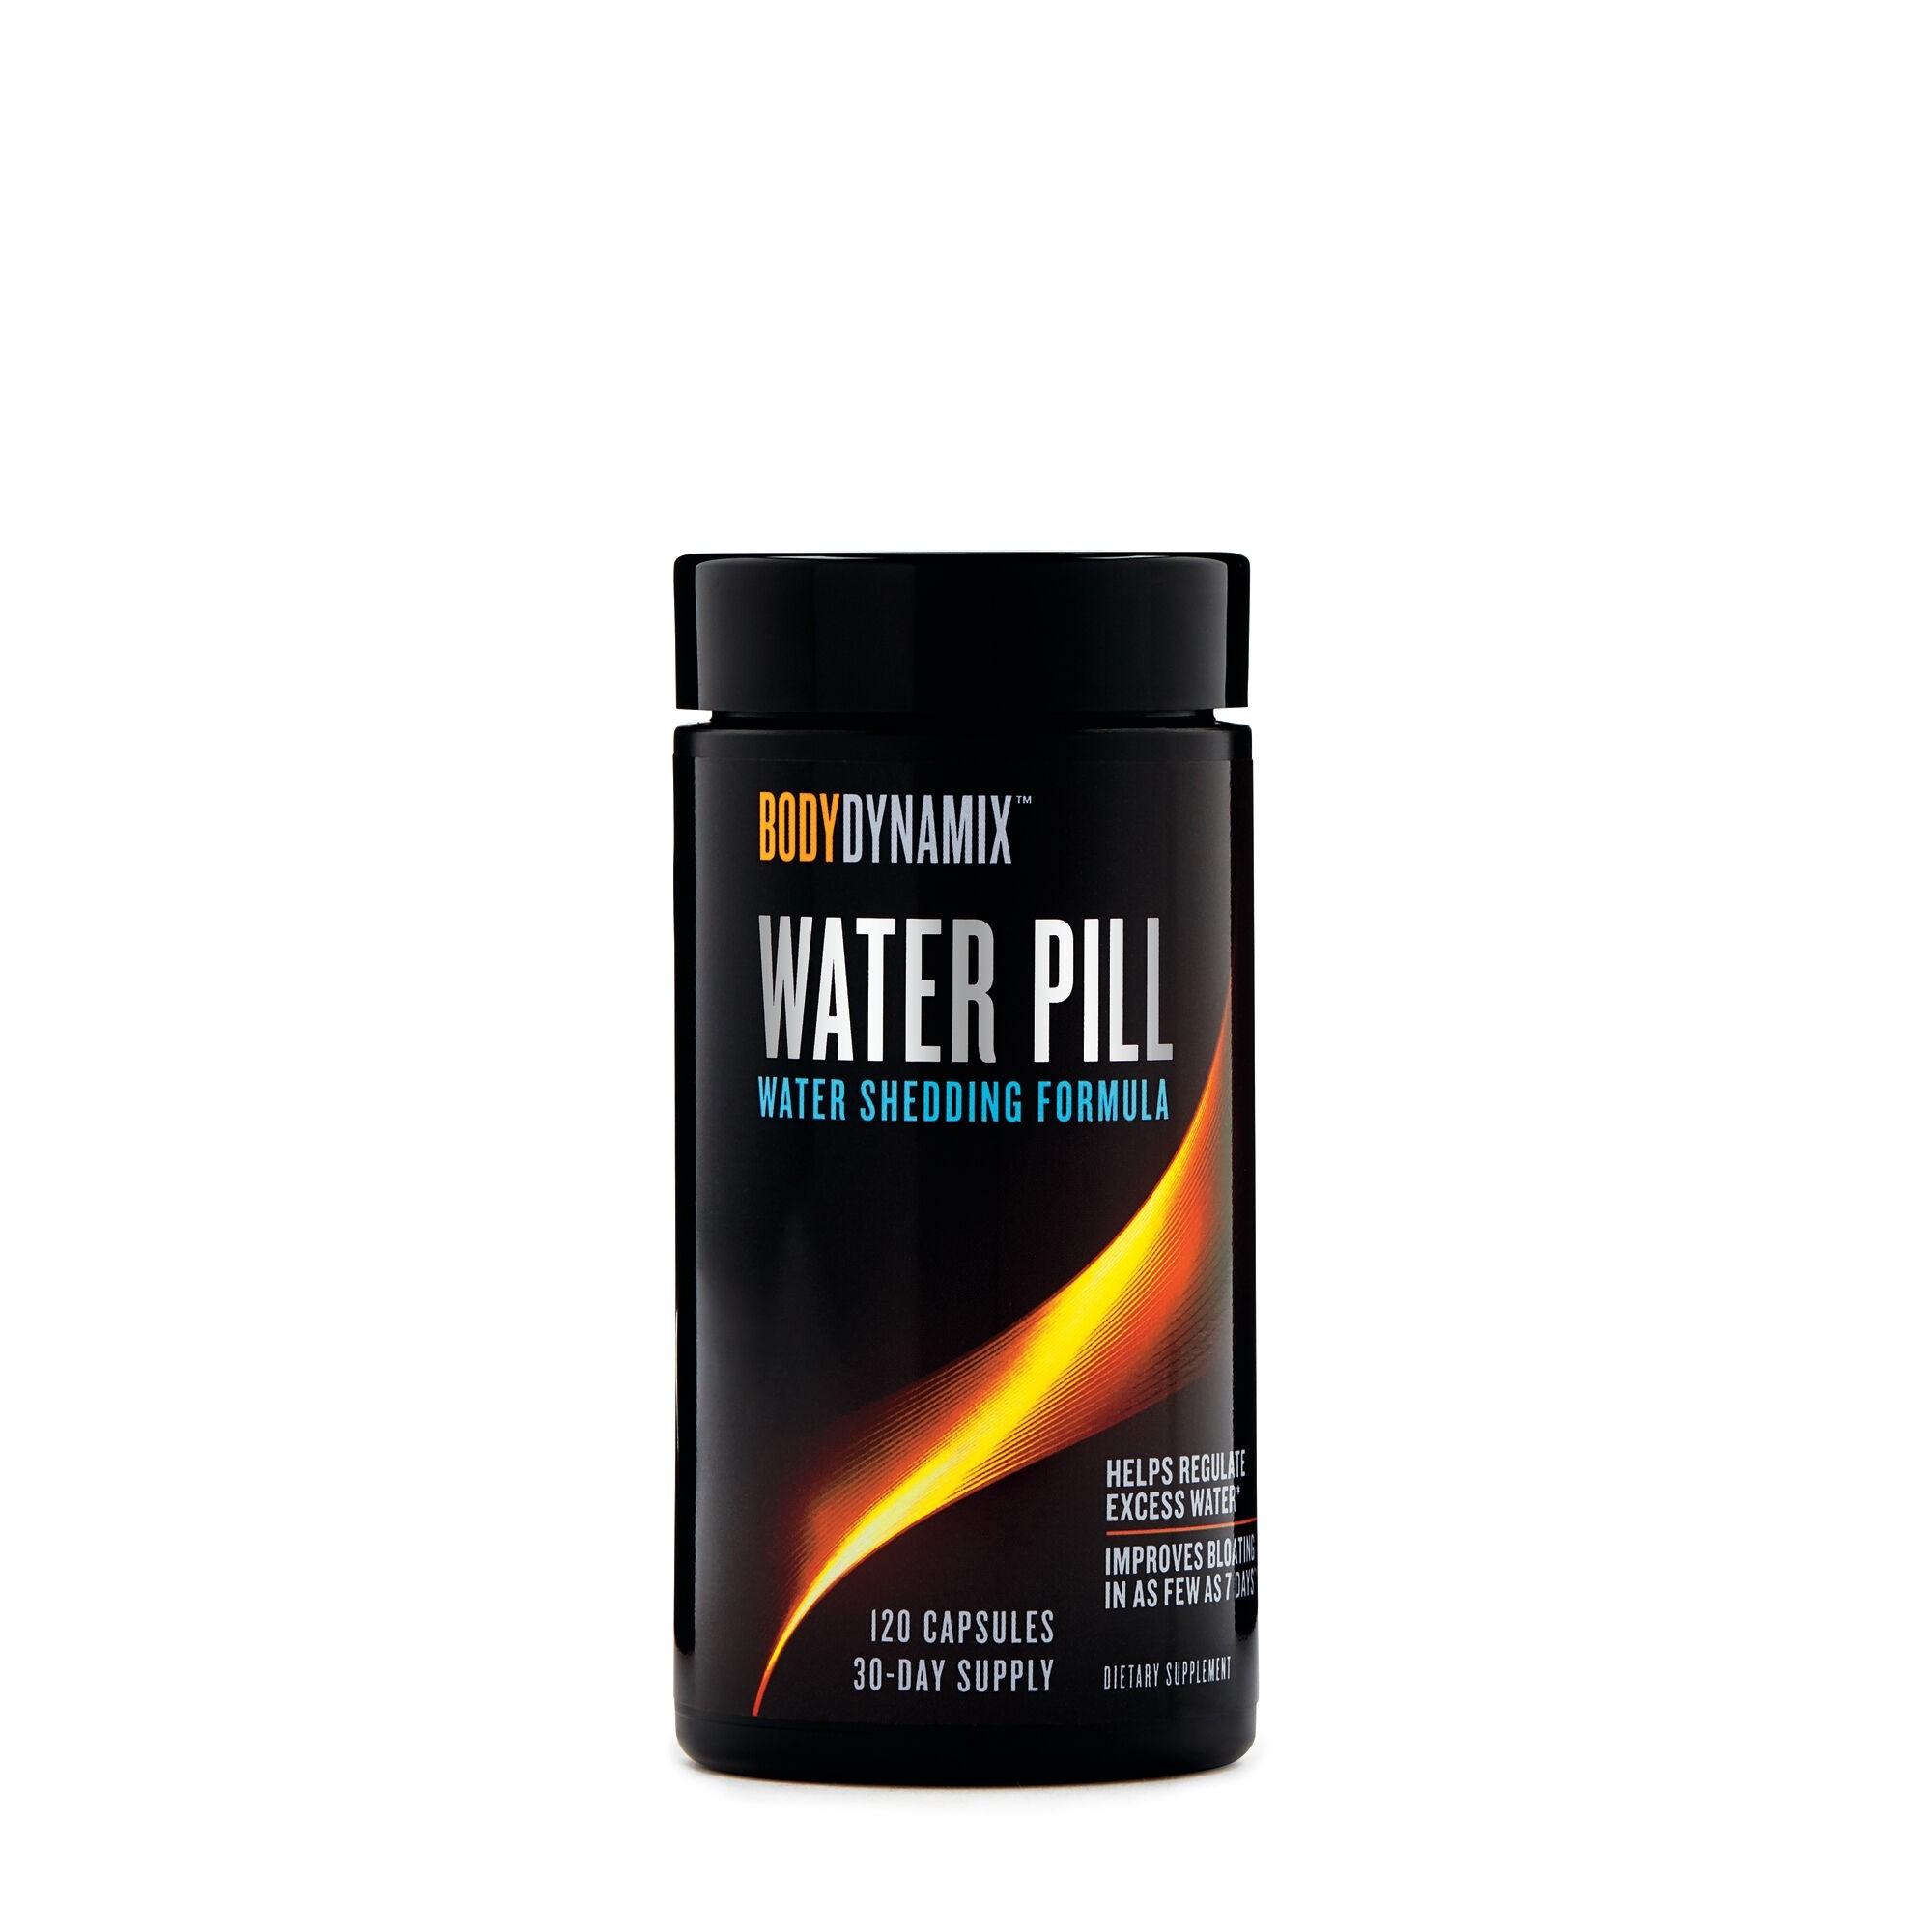 BodyDynamix™ Water Pill, Formula Pentru Reducerea Retentiei De Apa Din Organism, 120 cps